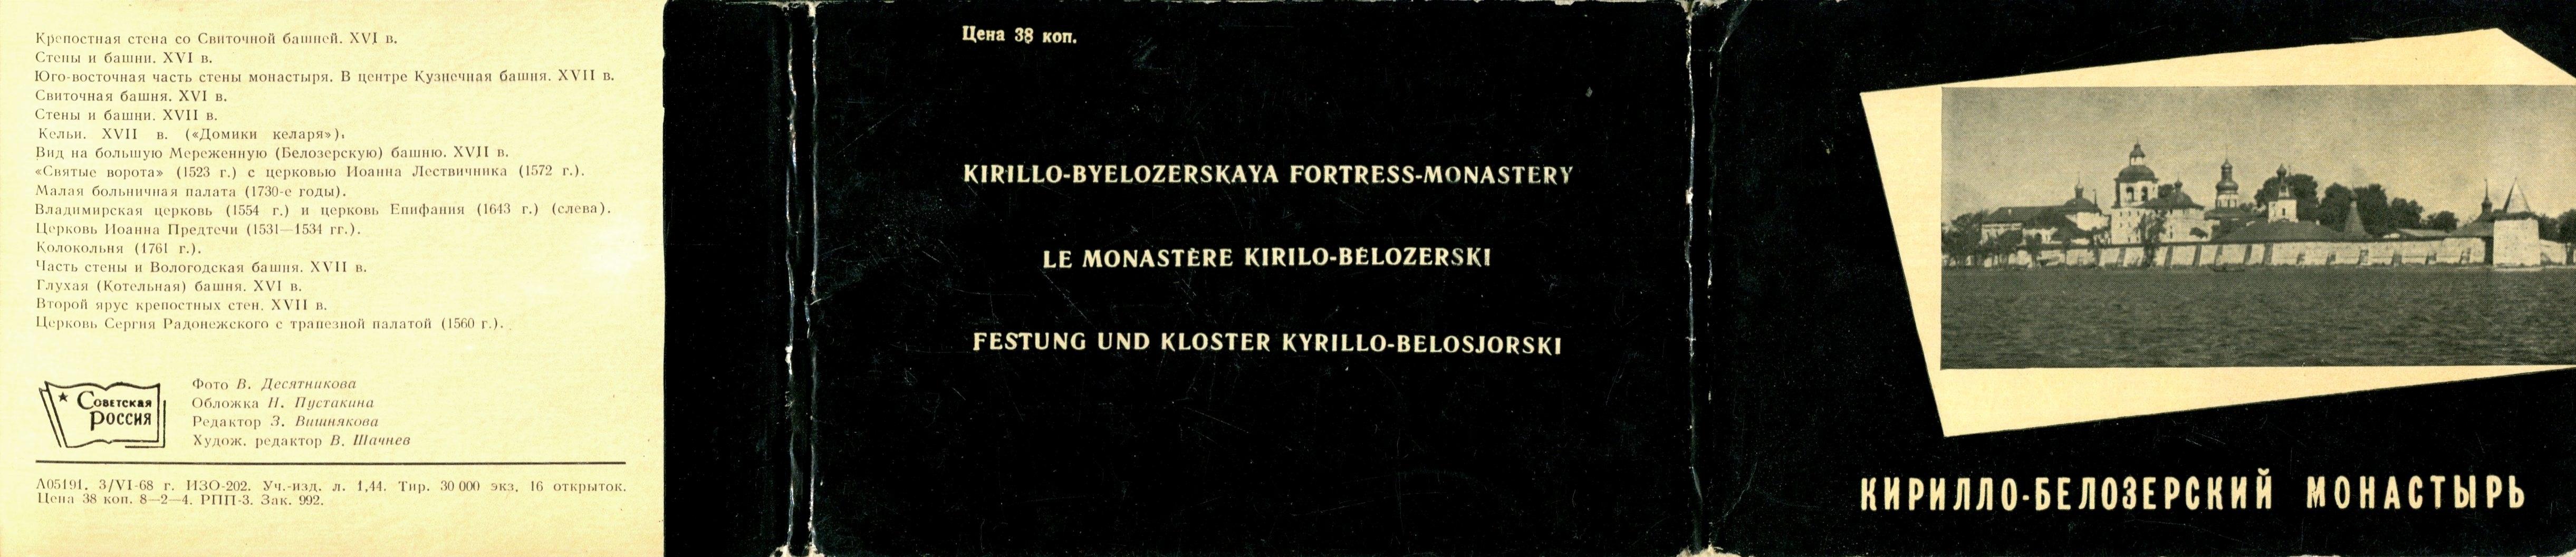 Кириллов 1960-х